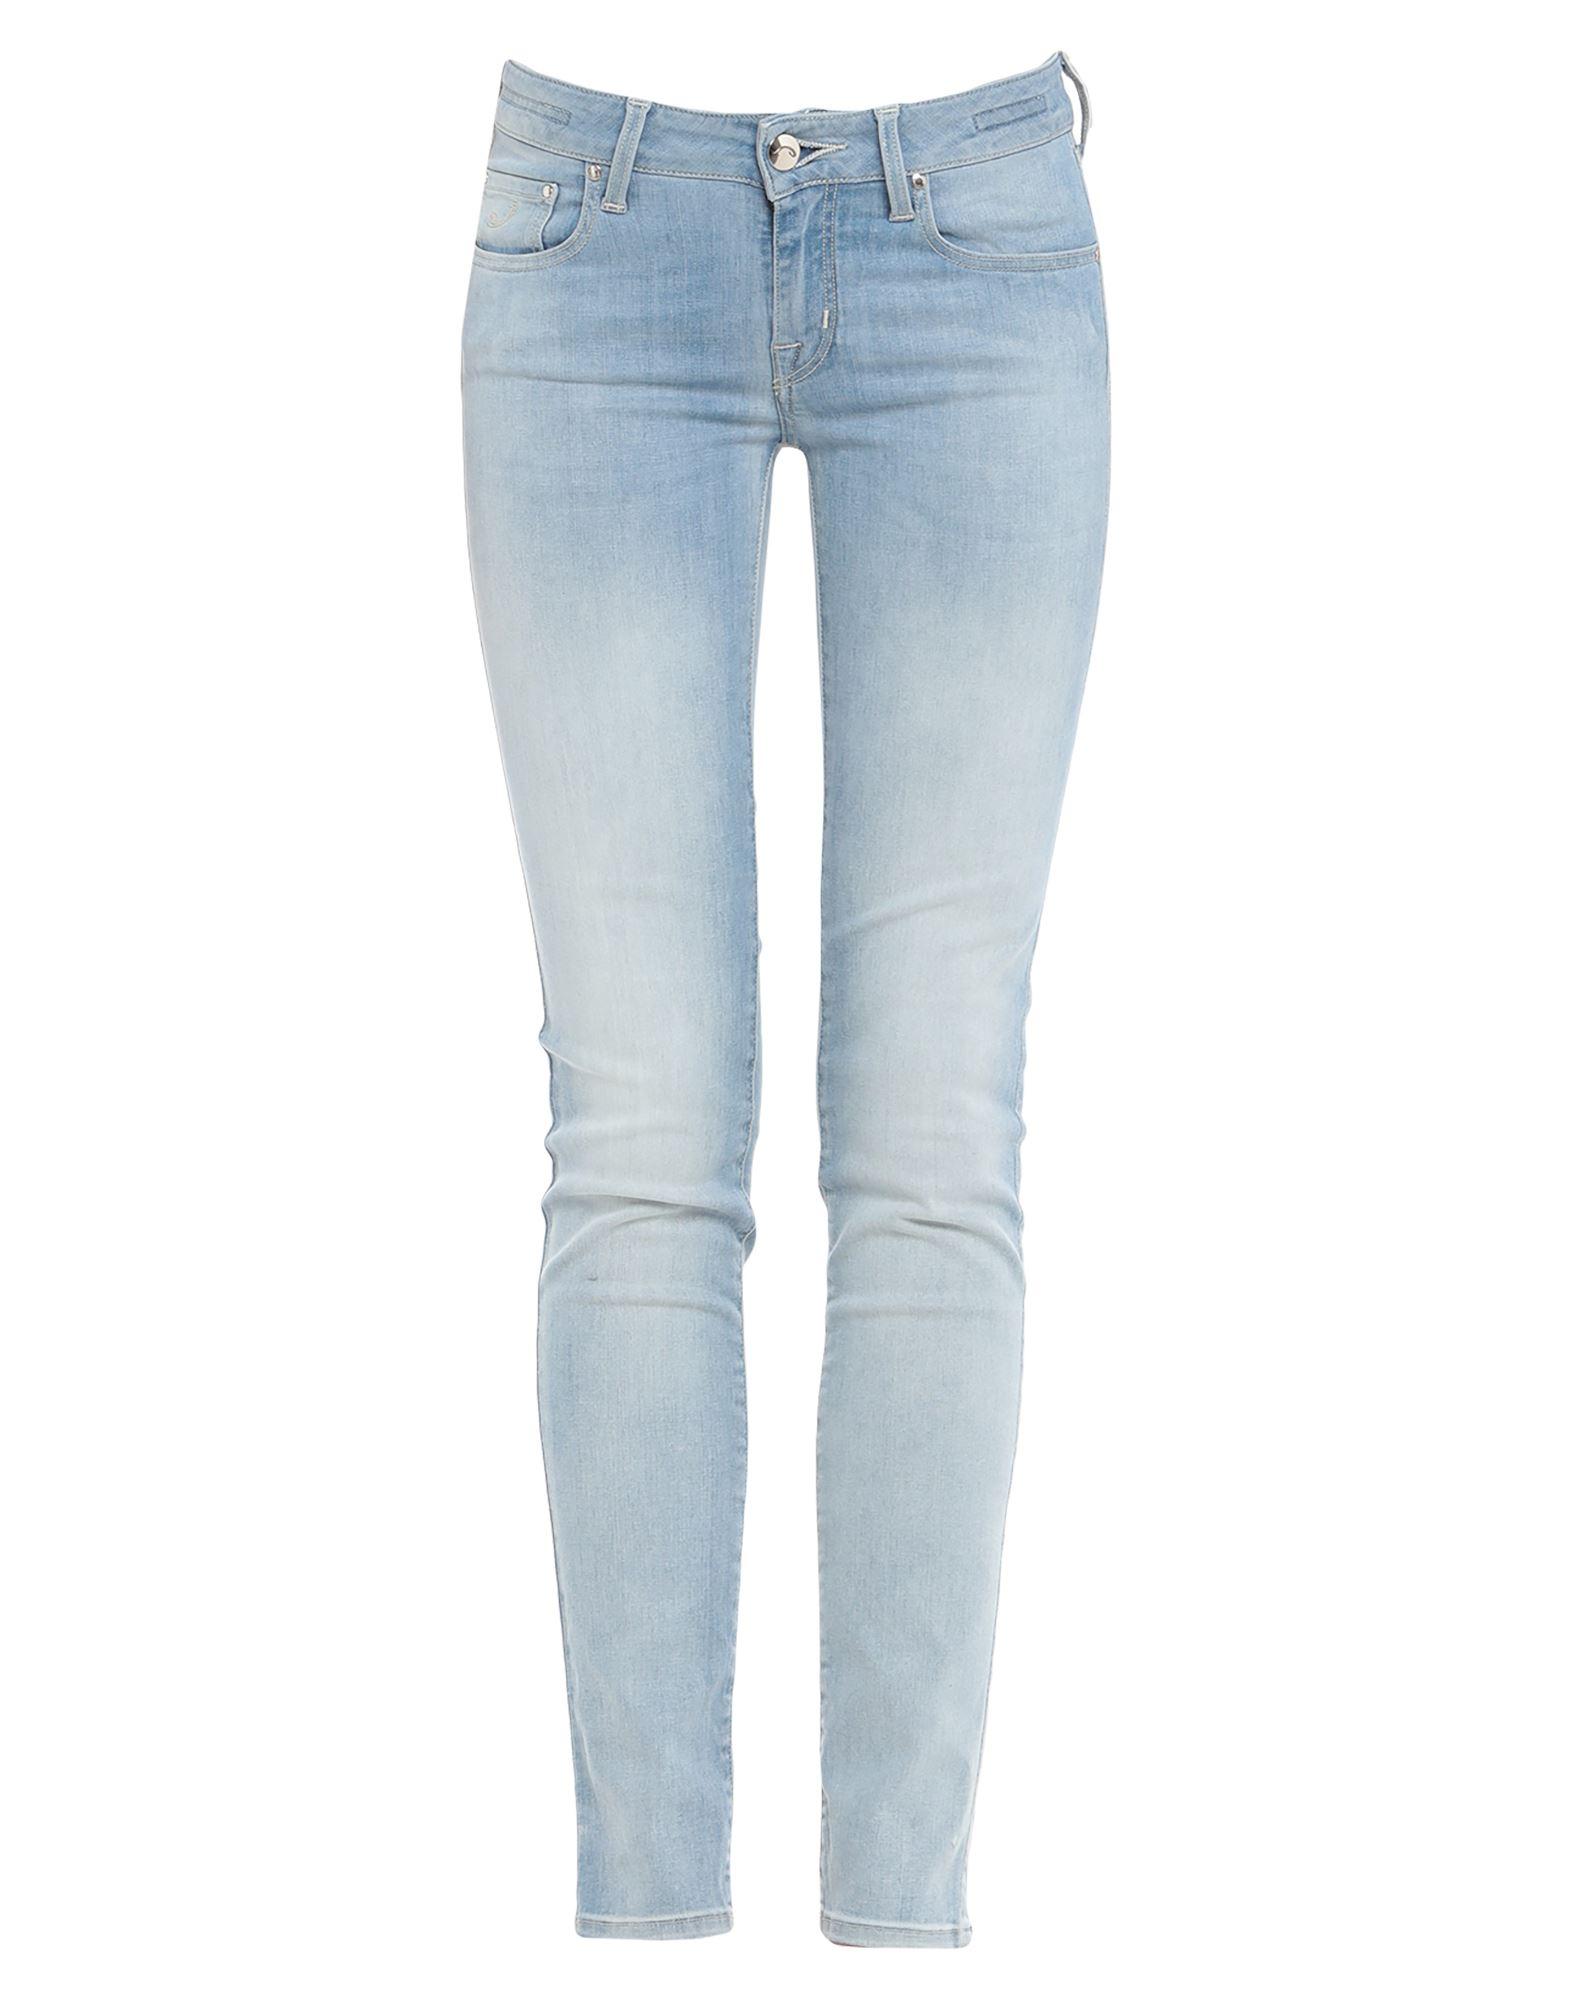 JACOB COHЁN Denim pants - Item 42819331